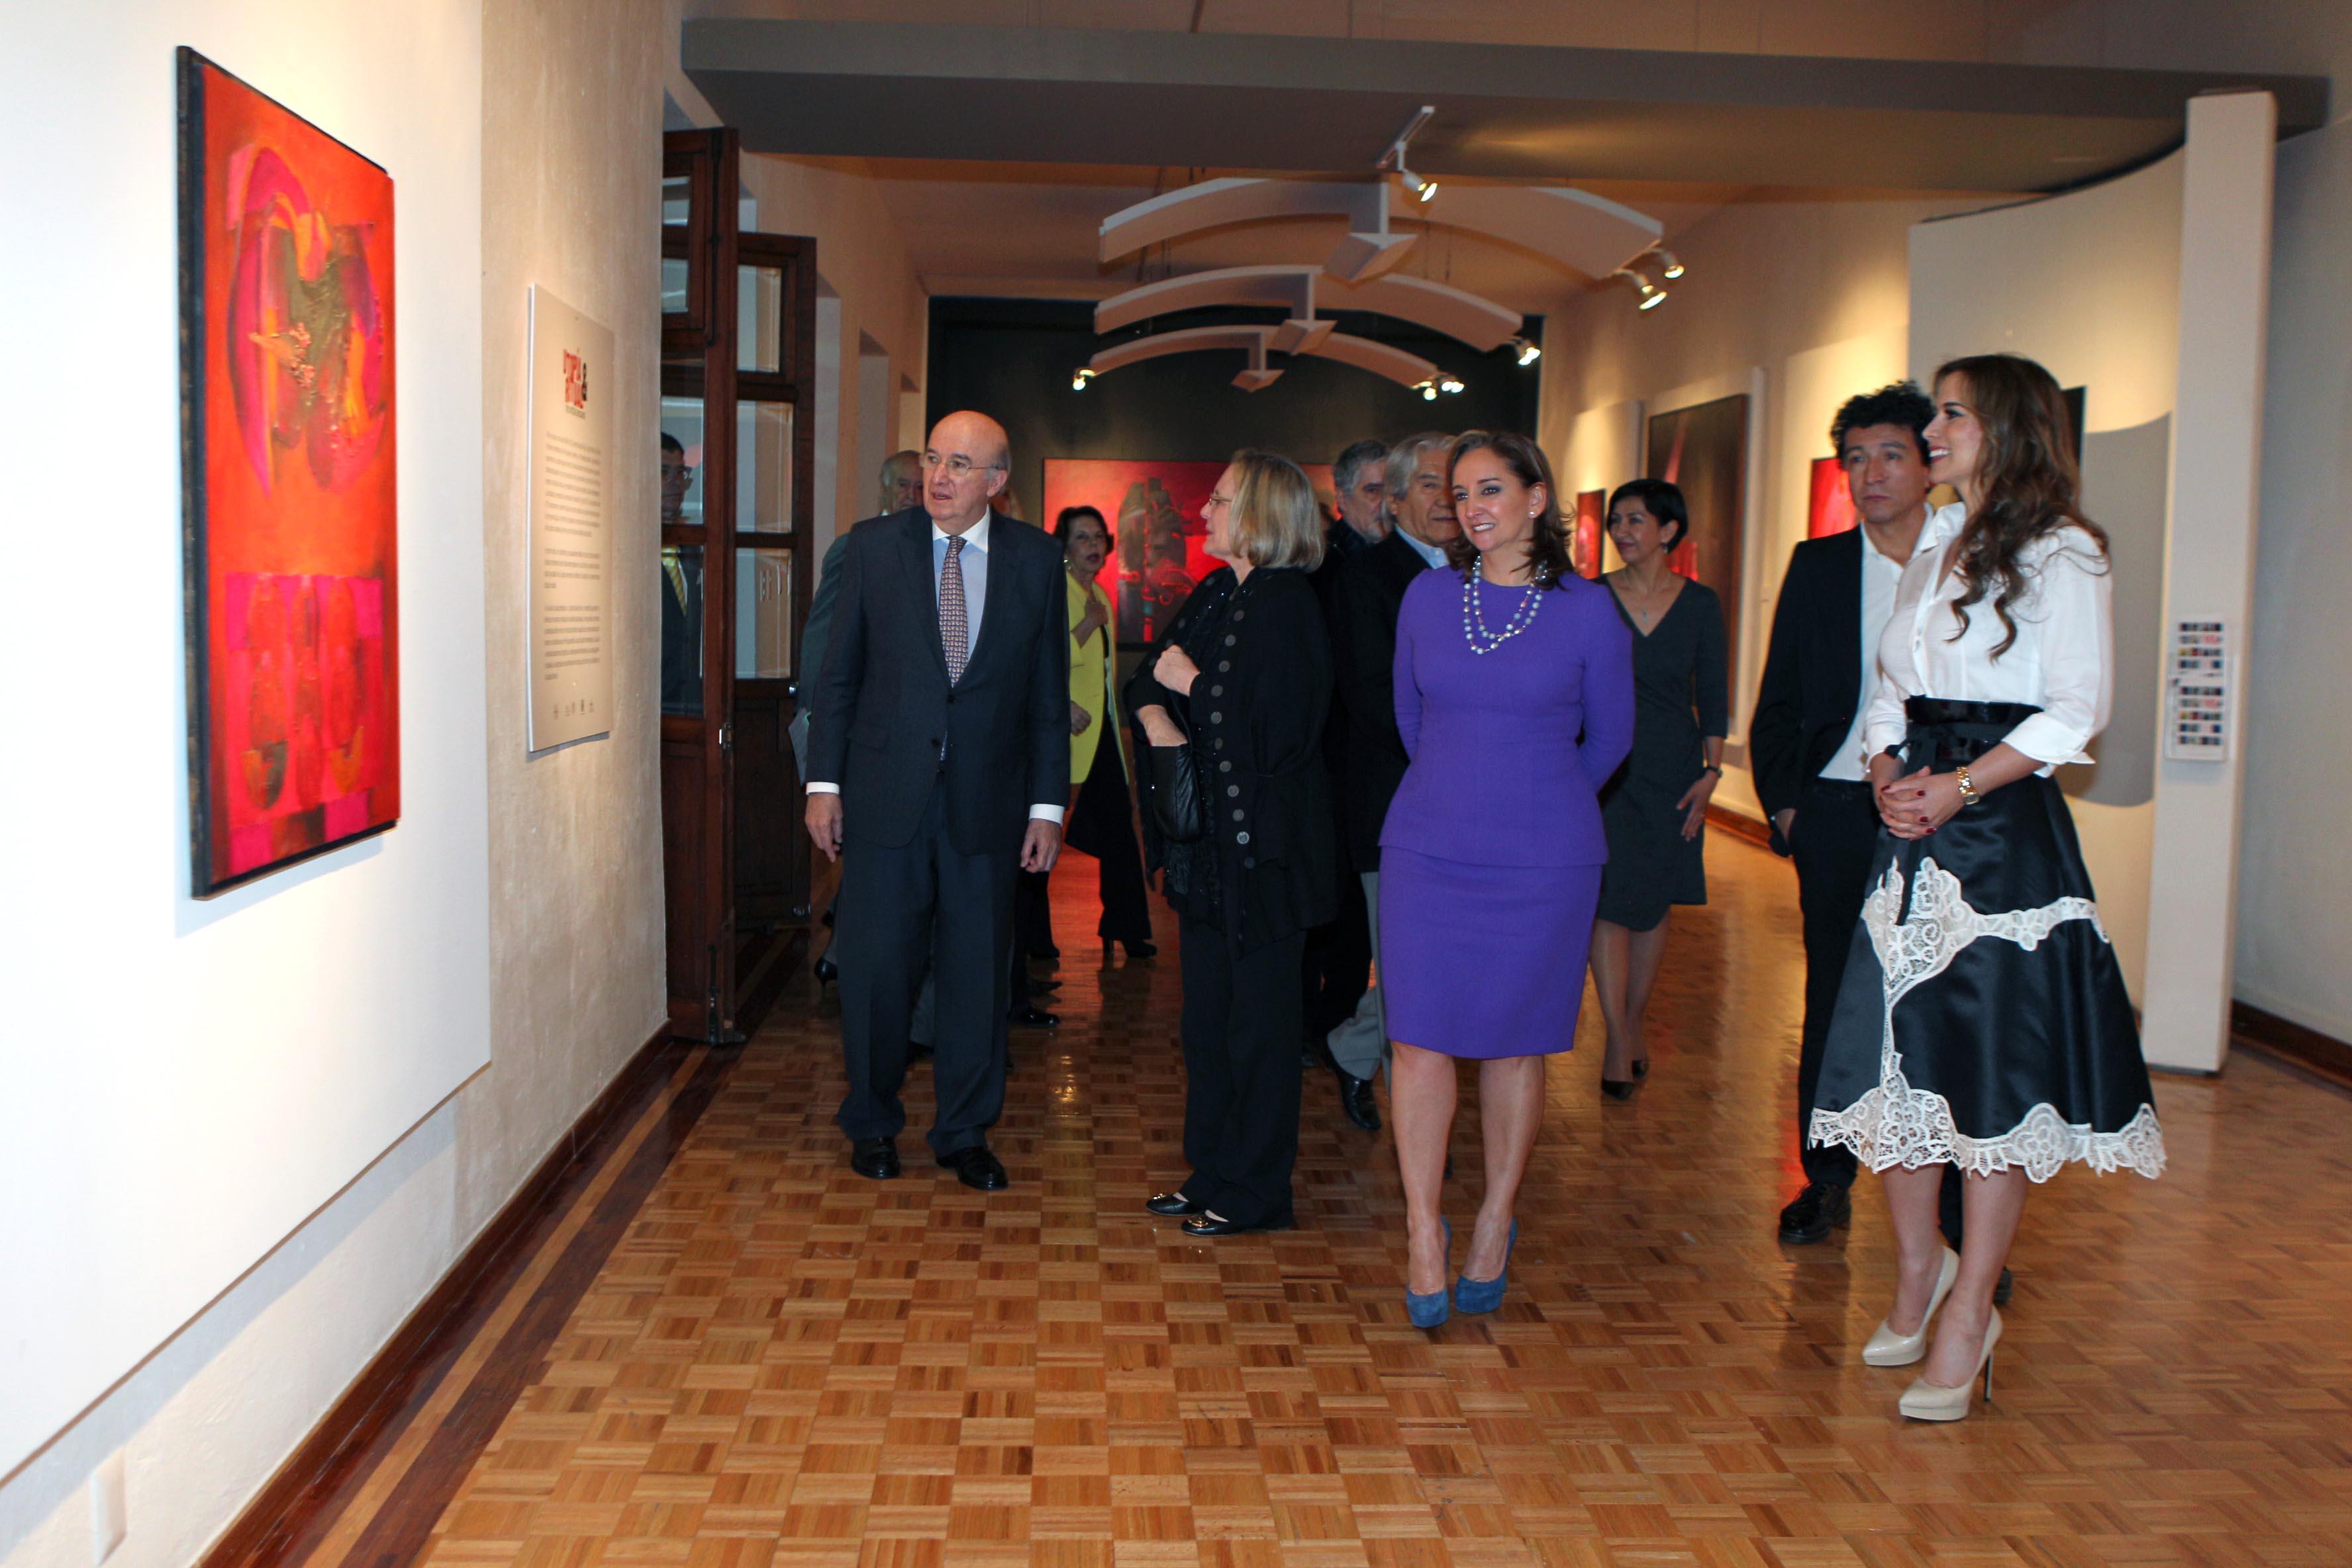 FOTO 3 La Canciller Claudia Ruiz Massieu inaugura exposici n de artistas peruanos.jpg